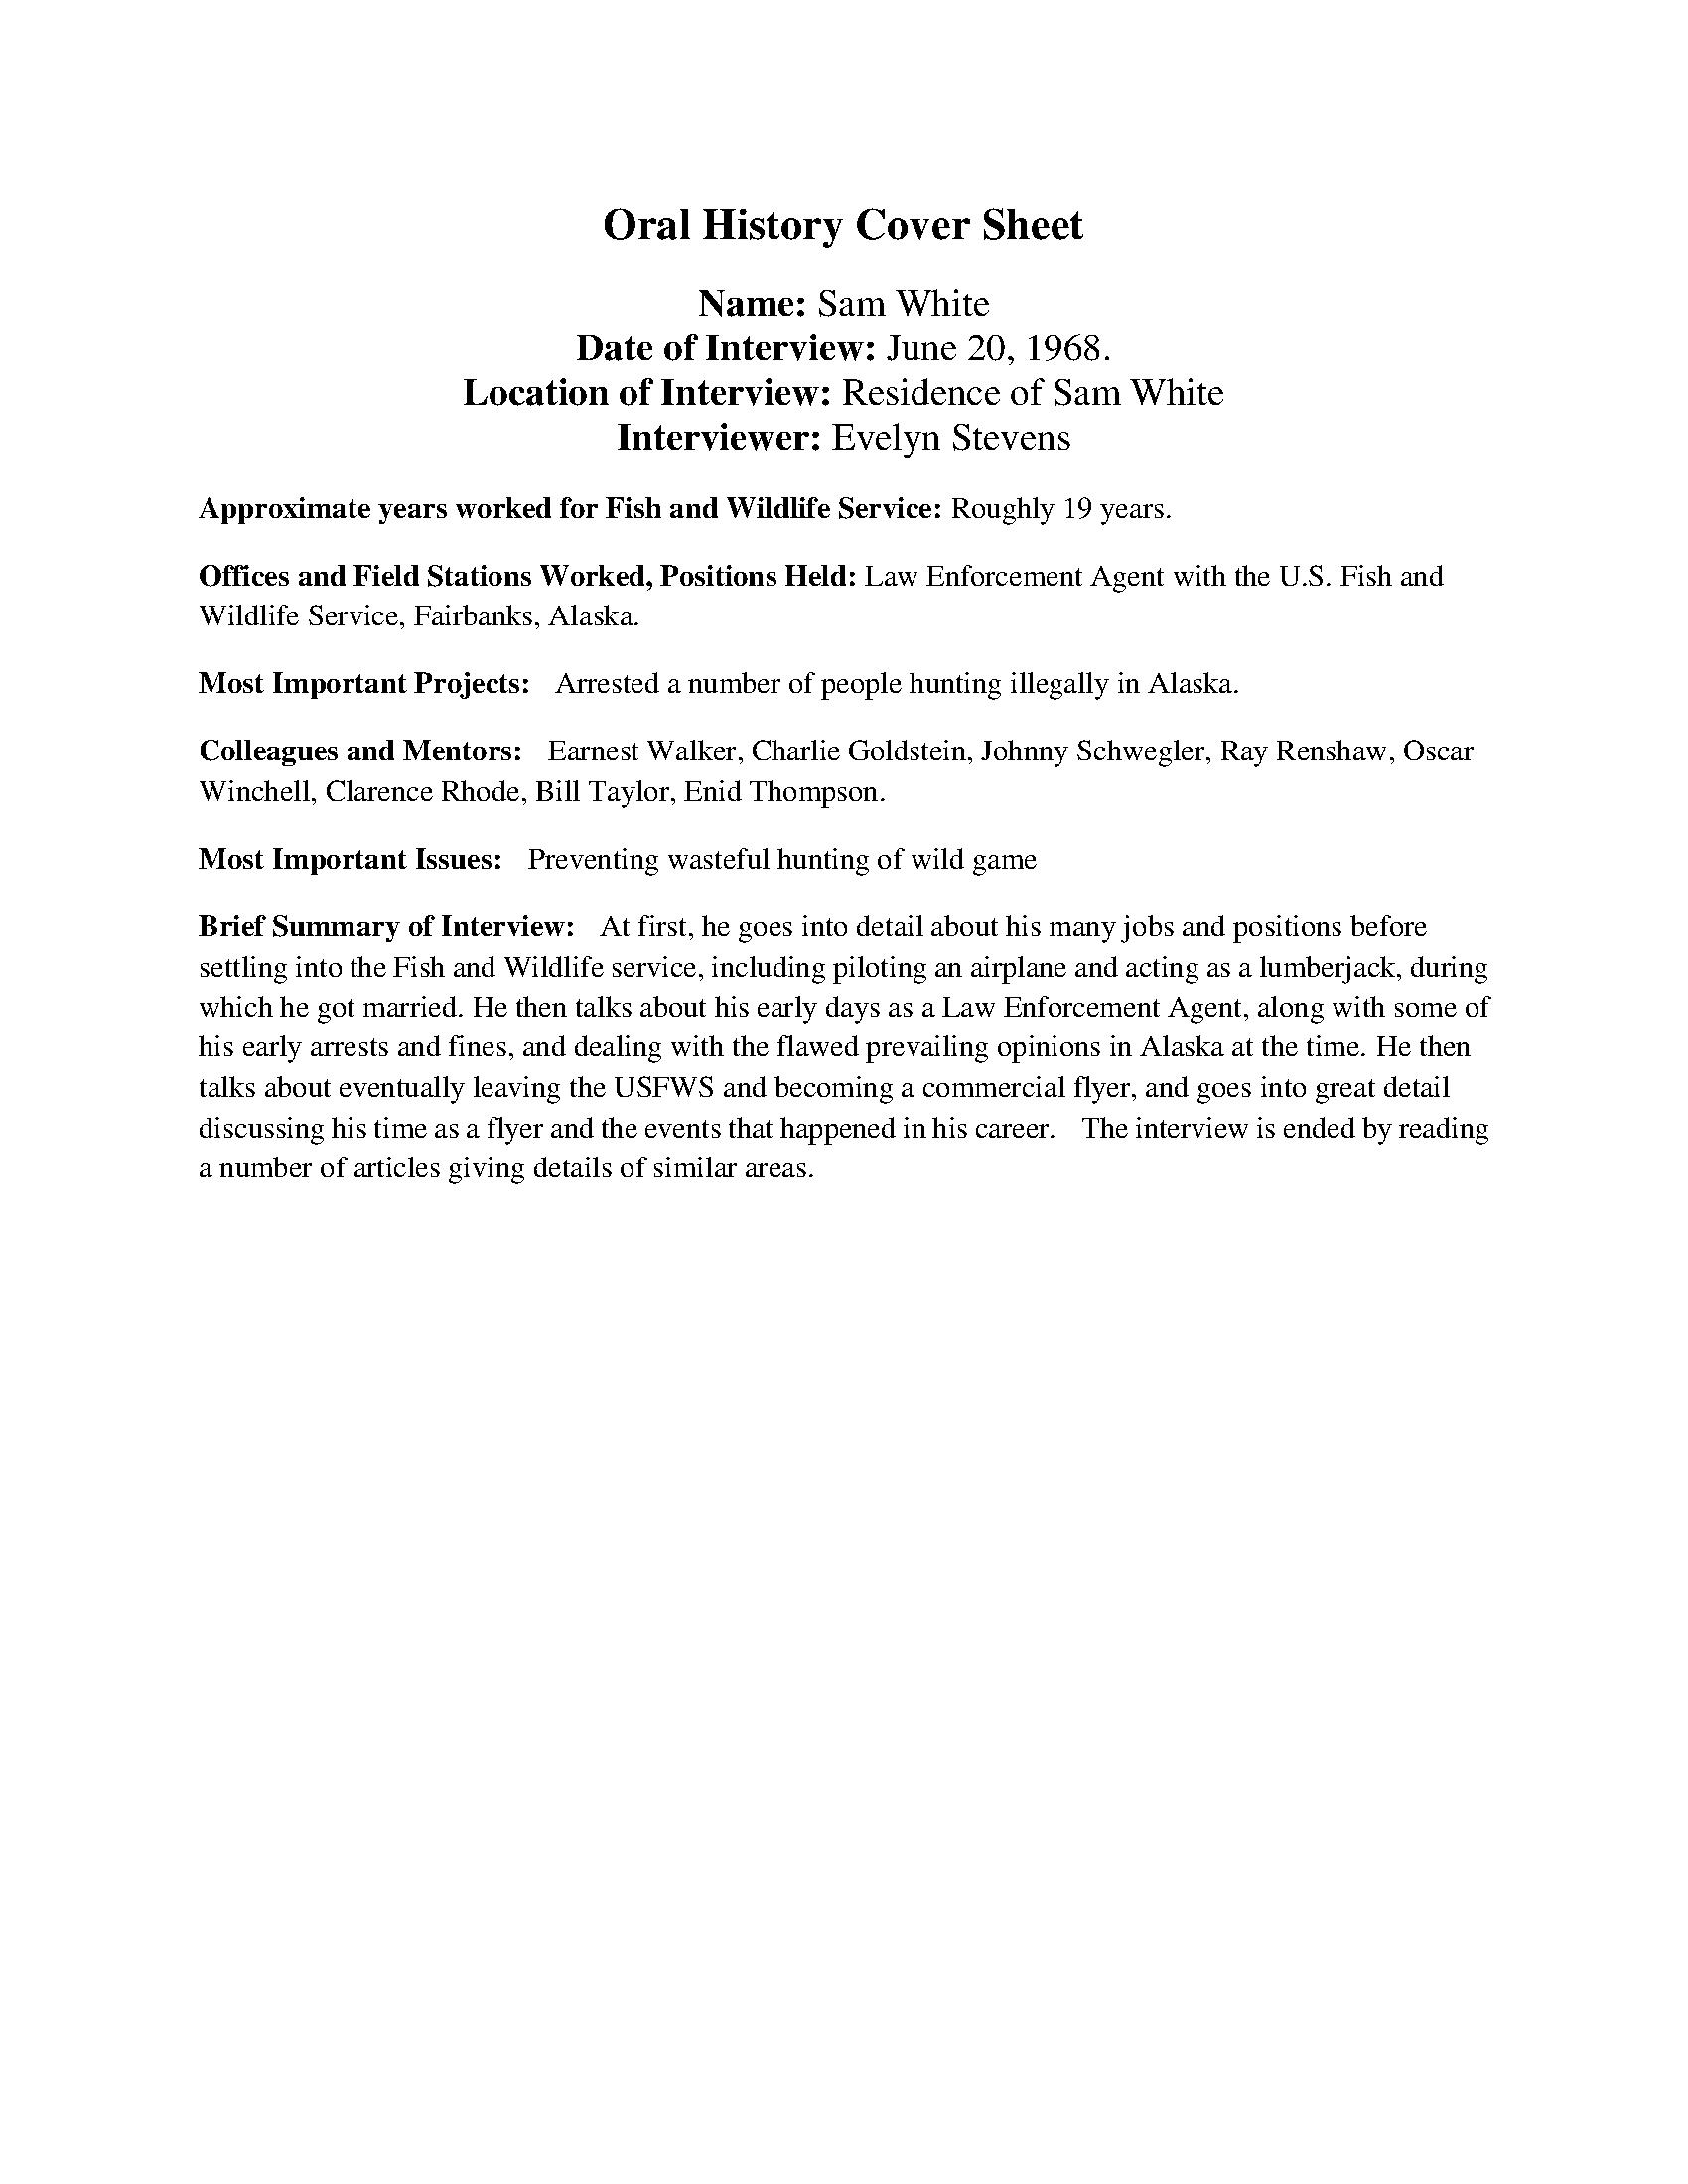 Sam White Oral History Transcript